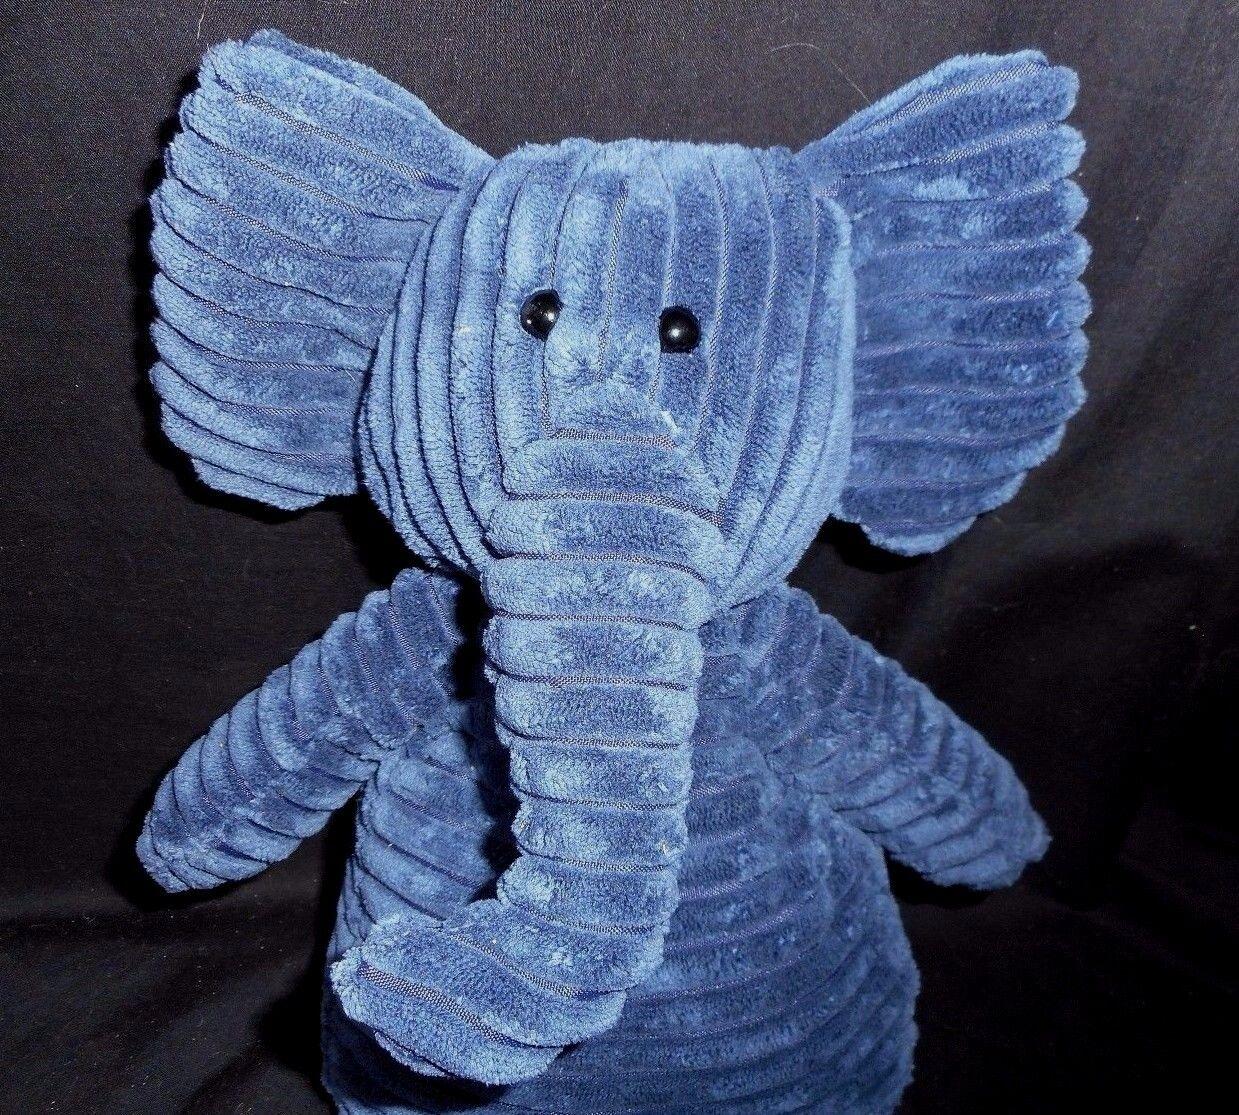 16  JELLYCAT CORDY CORDUROY NAVY blueE ELEPHANT STUFFED ANIMAL ANIMAL ANIMAL PLUSH TOY SOFT 850db3